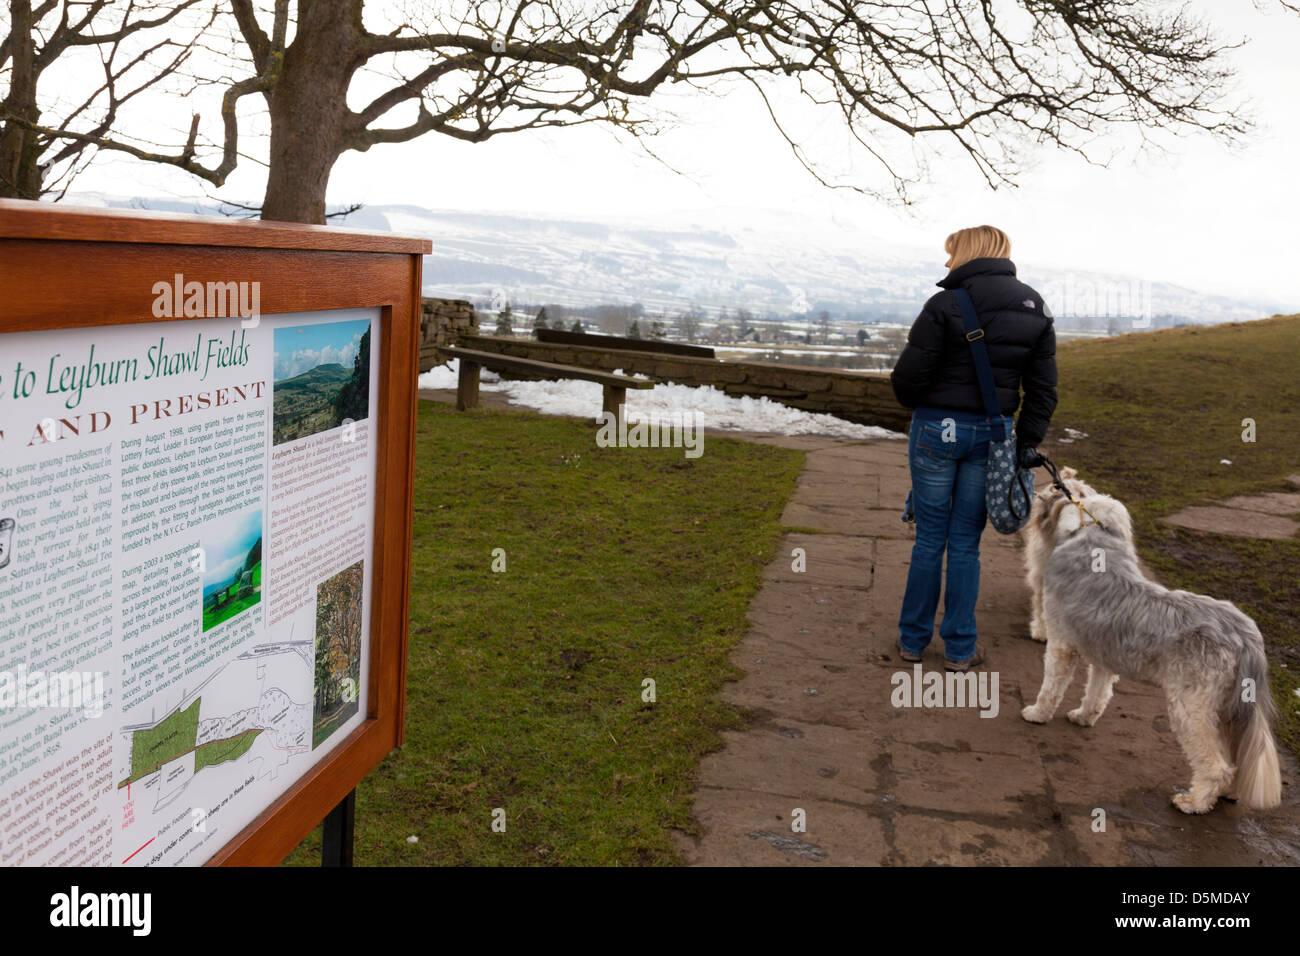 Yorkshire Dales, UK, England Lady and dogs at Leyburn Shawl on path near sign - Stock Image